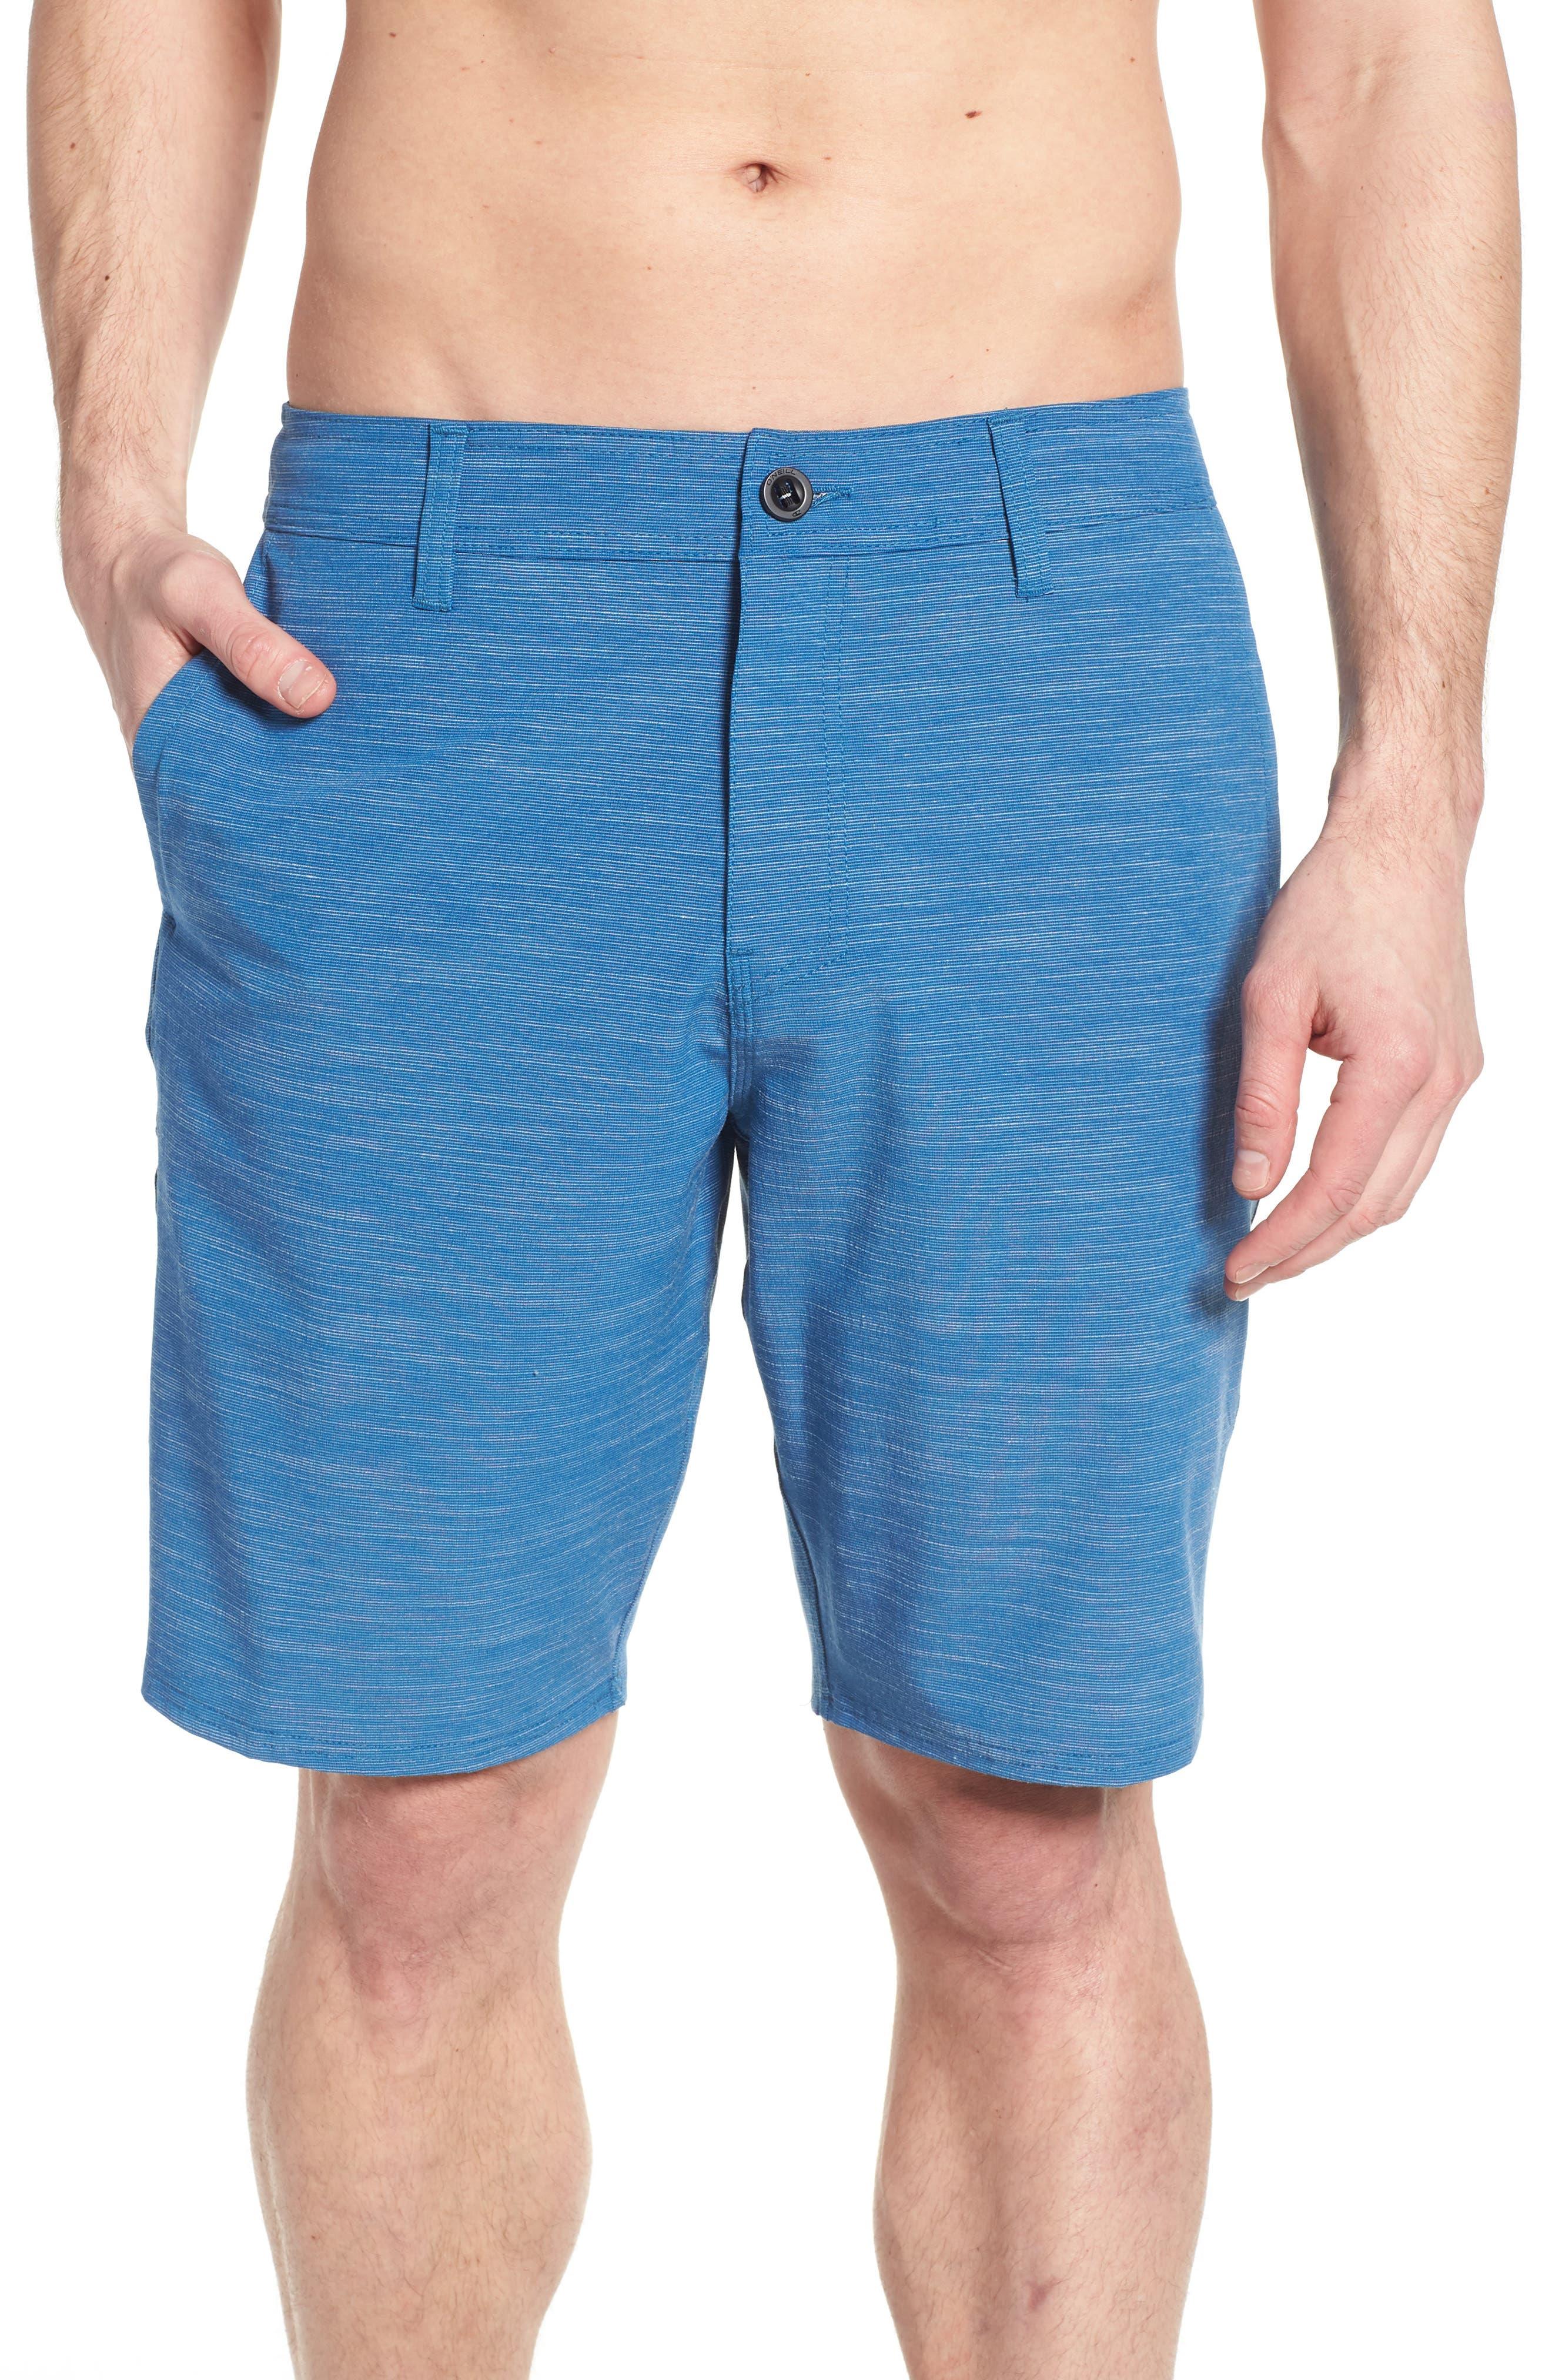 Locked Slub Hybrid Shorts,                             Alternate thumbnail 4, color,                             Air Force Blue